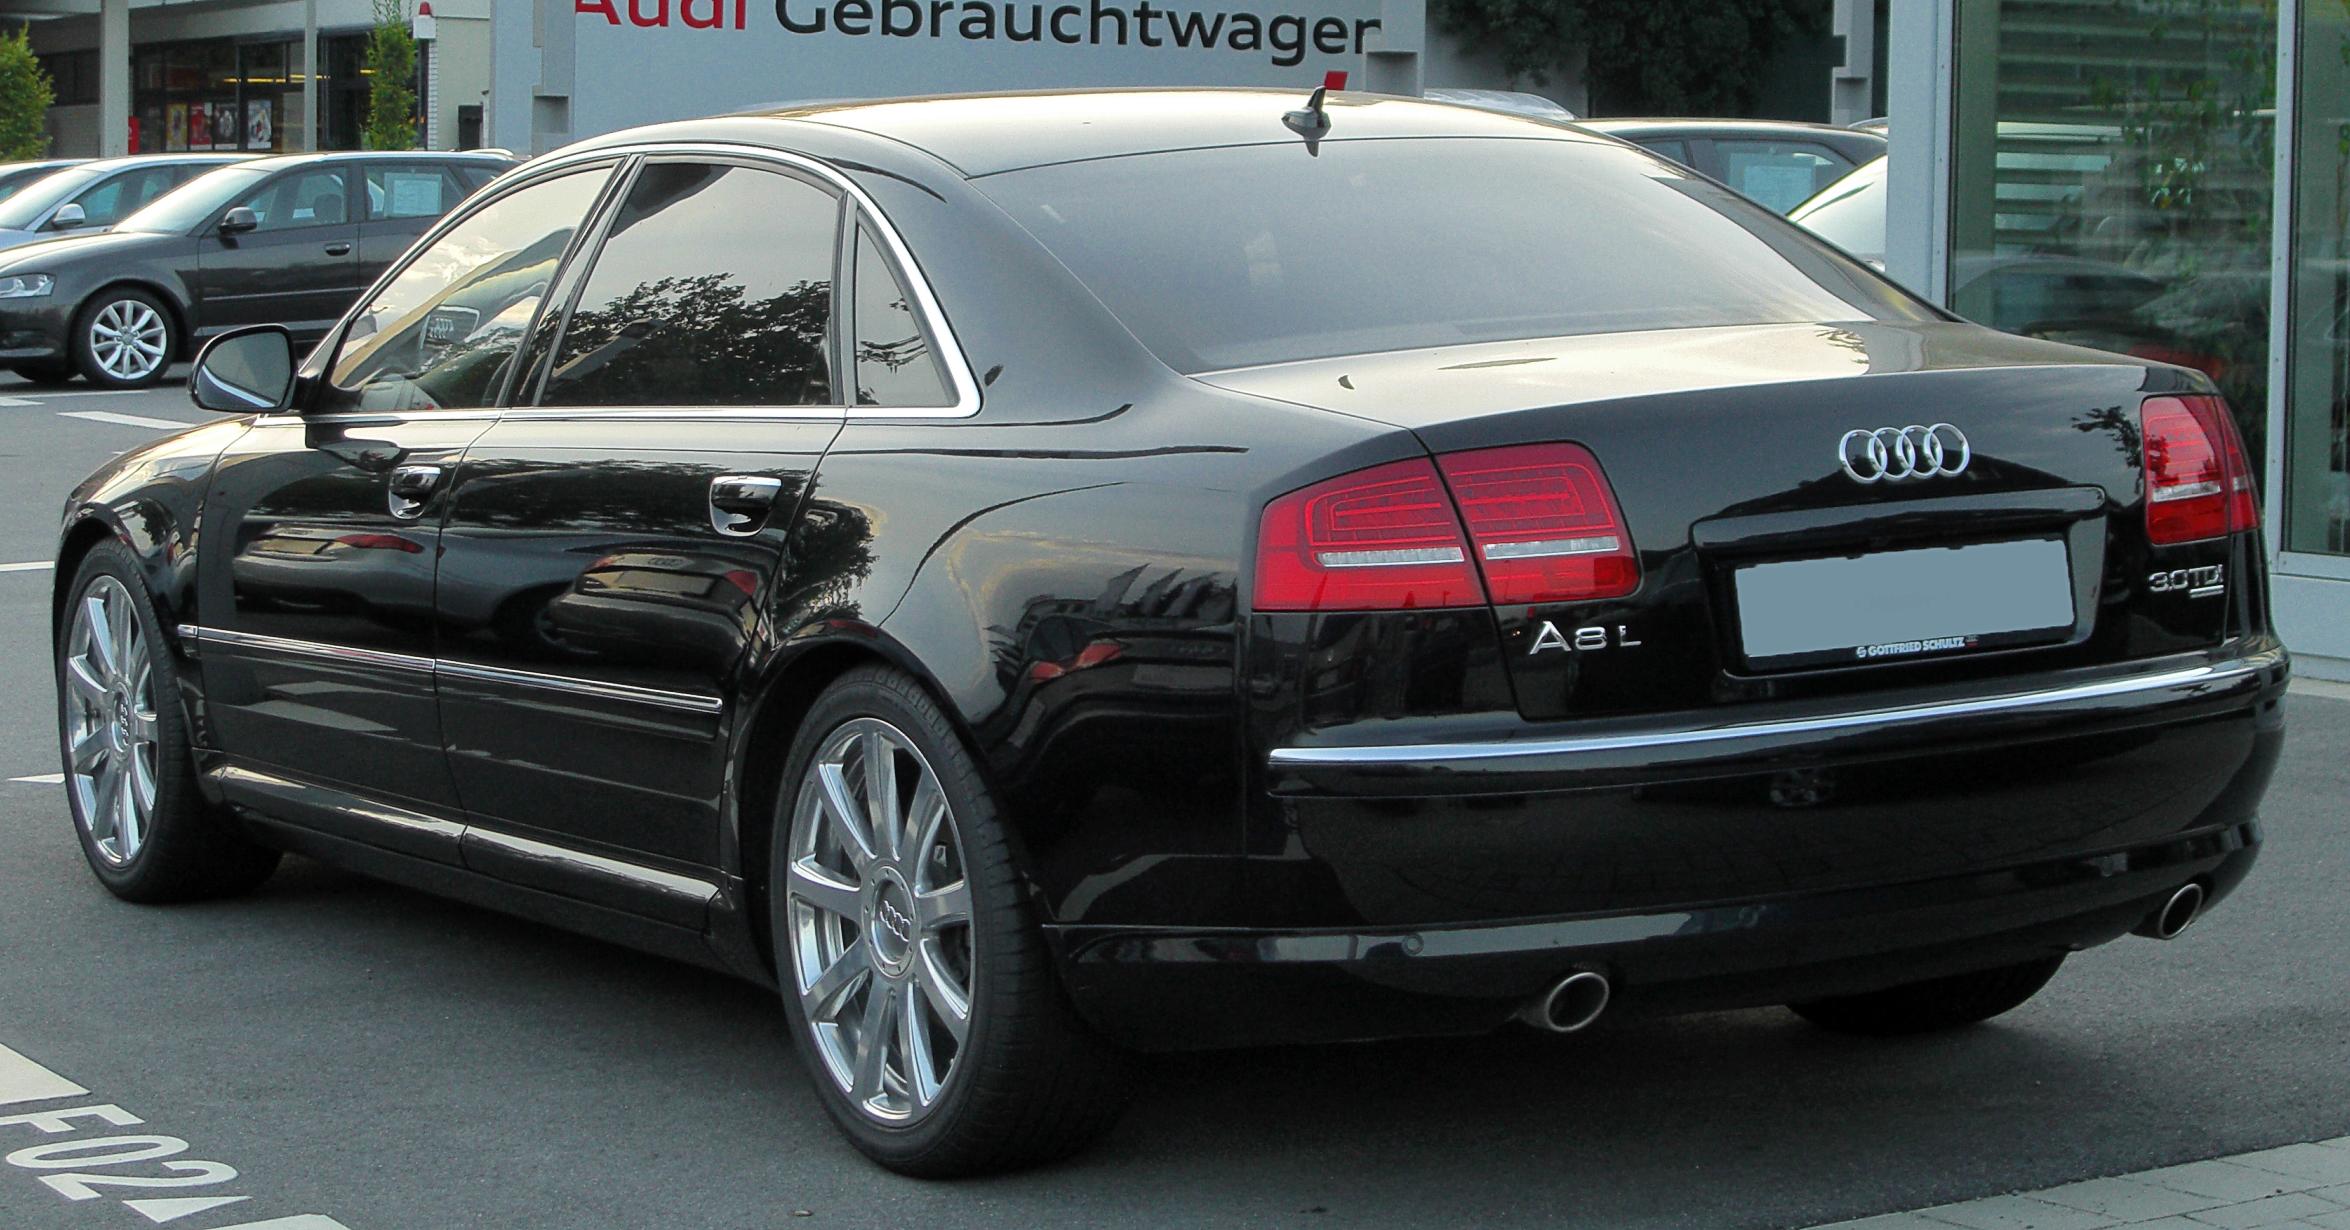 Audi A8 II (D3) Restyling 2 2007 - 2010 Sedan #3